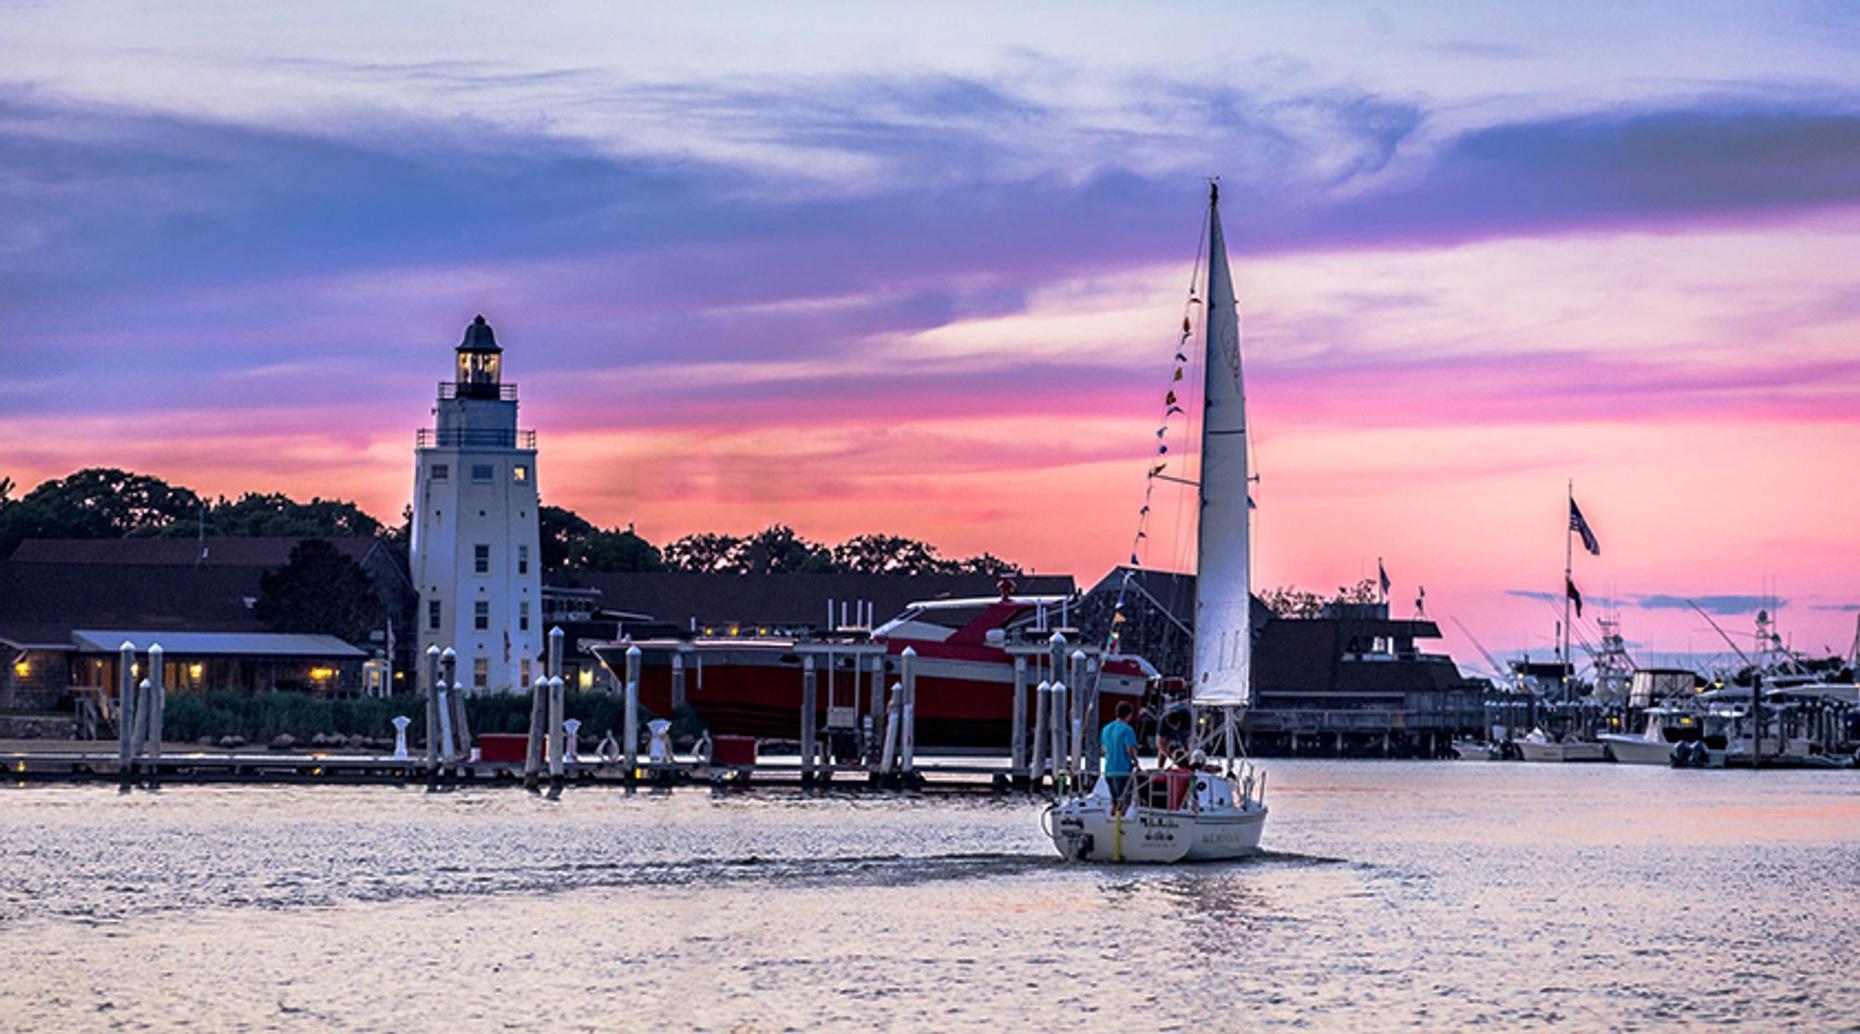 Montauk Harbor Taste of Sailing